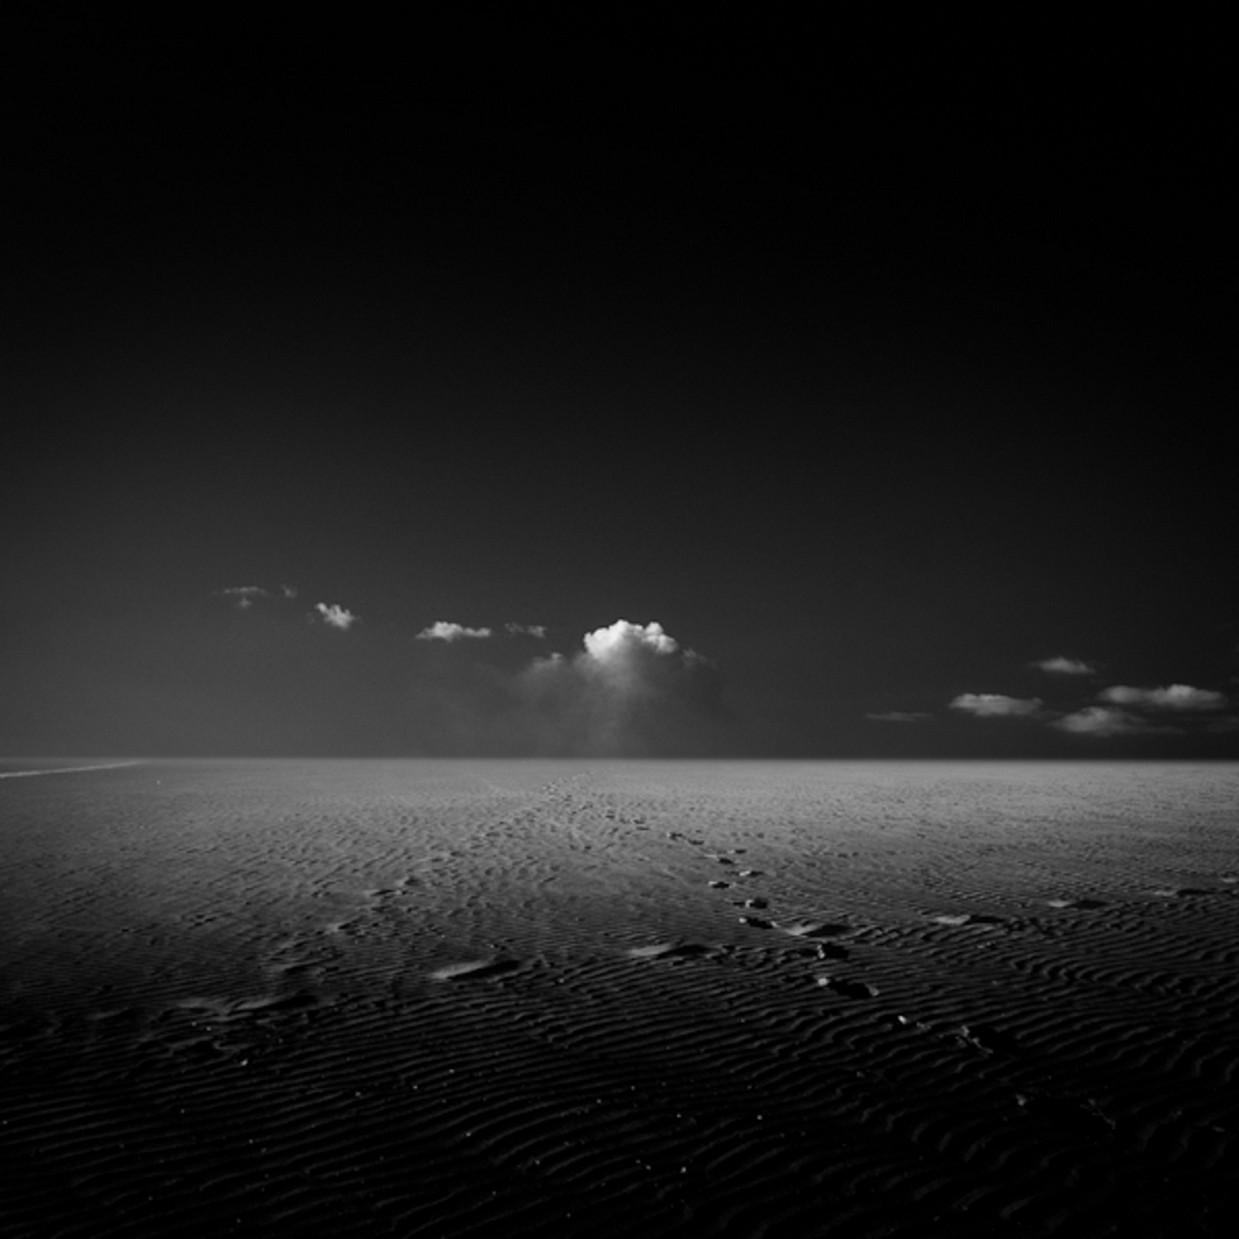 fotograf-Zoltan-Bekefi_7